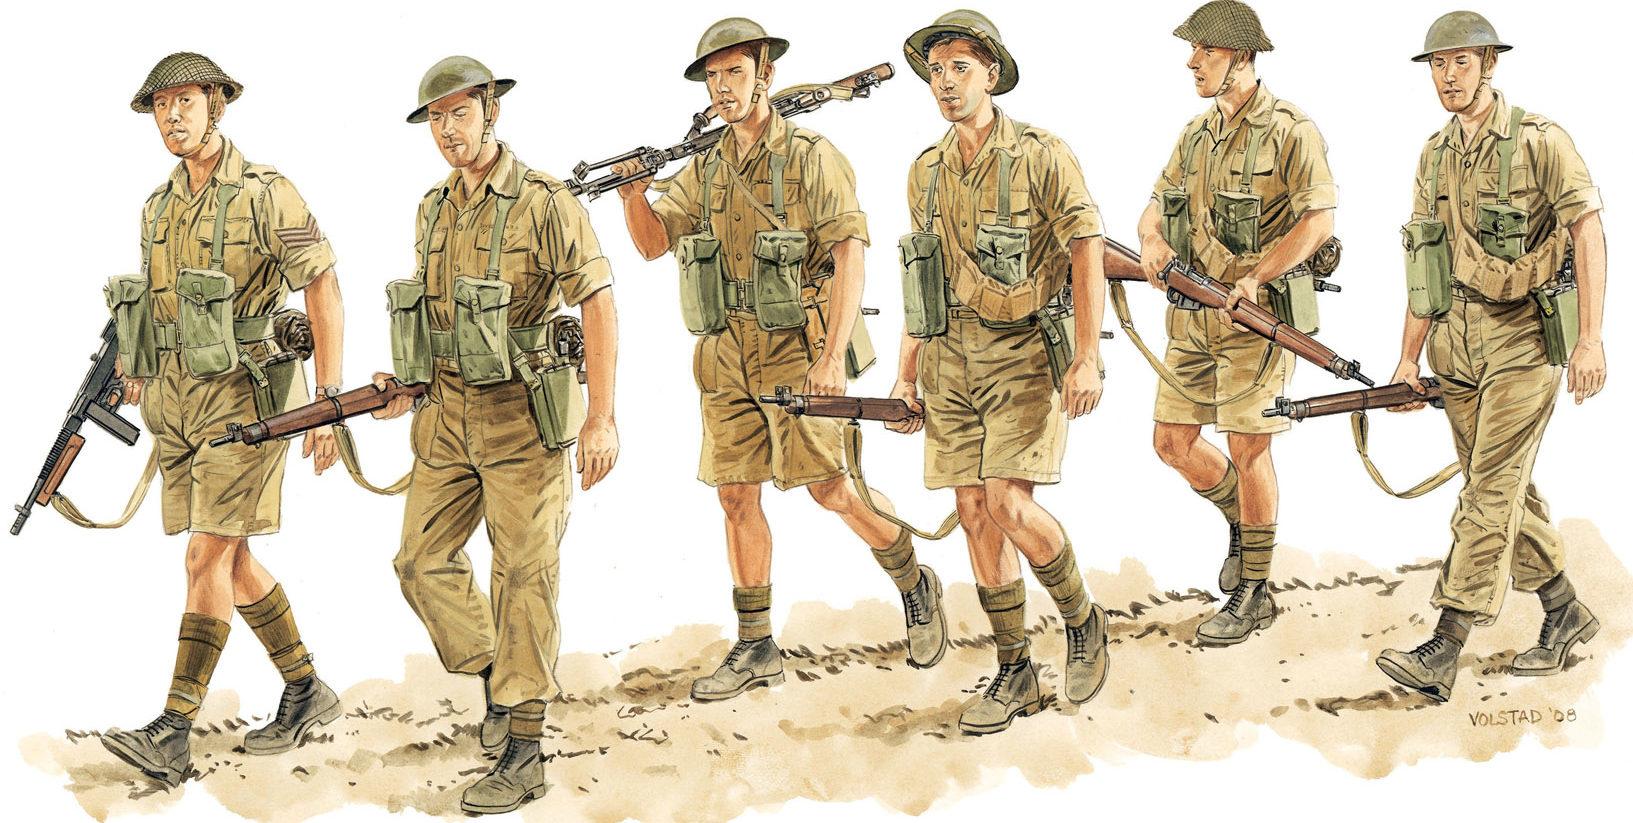 Volstad Ronald. Британская пехота.